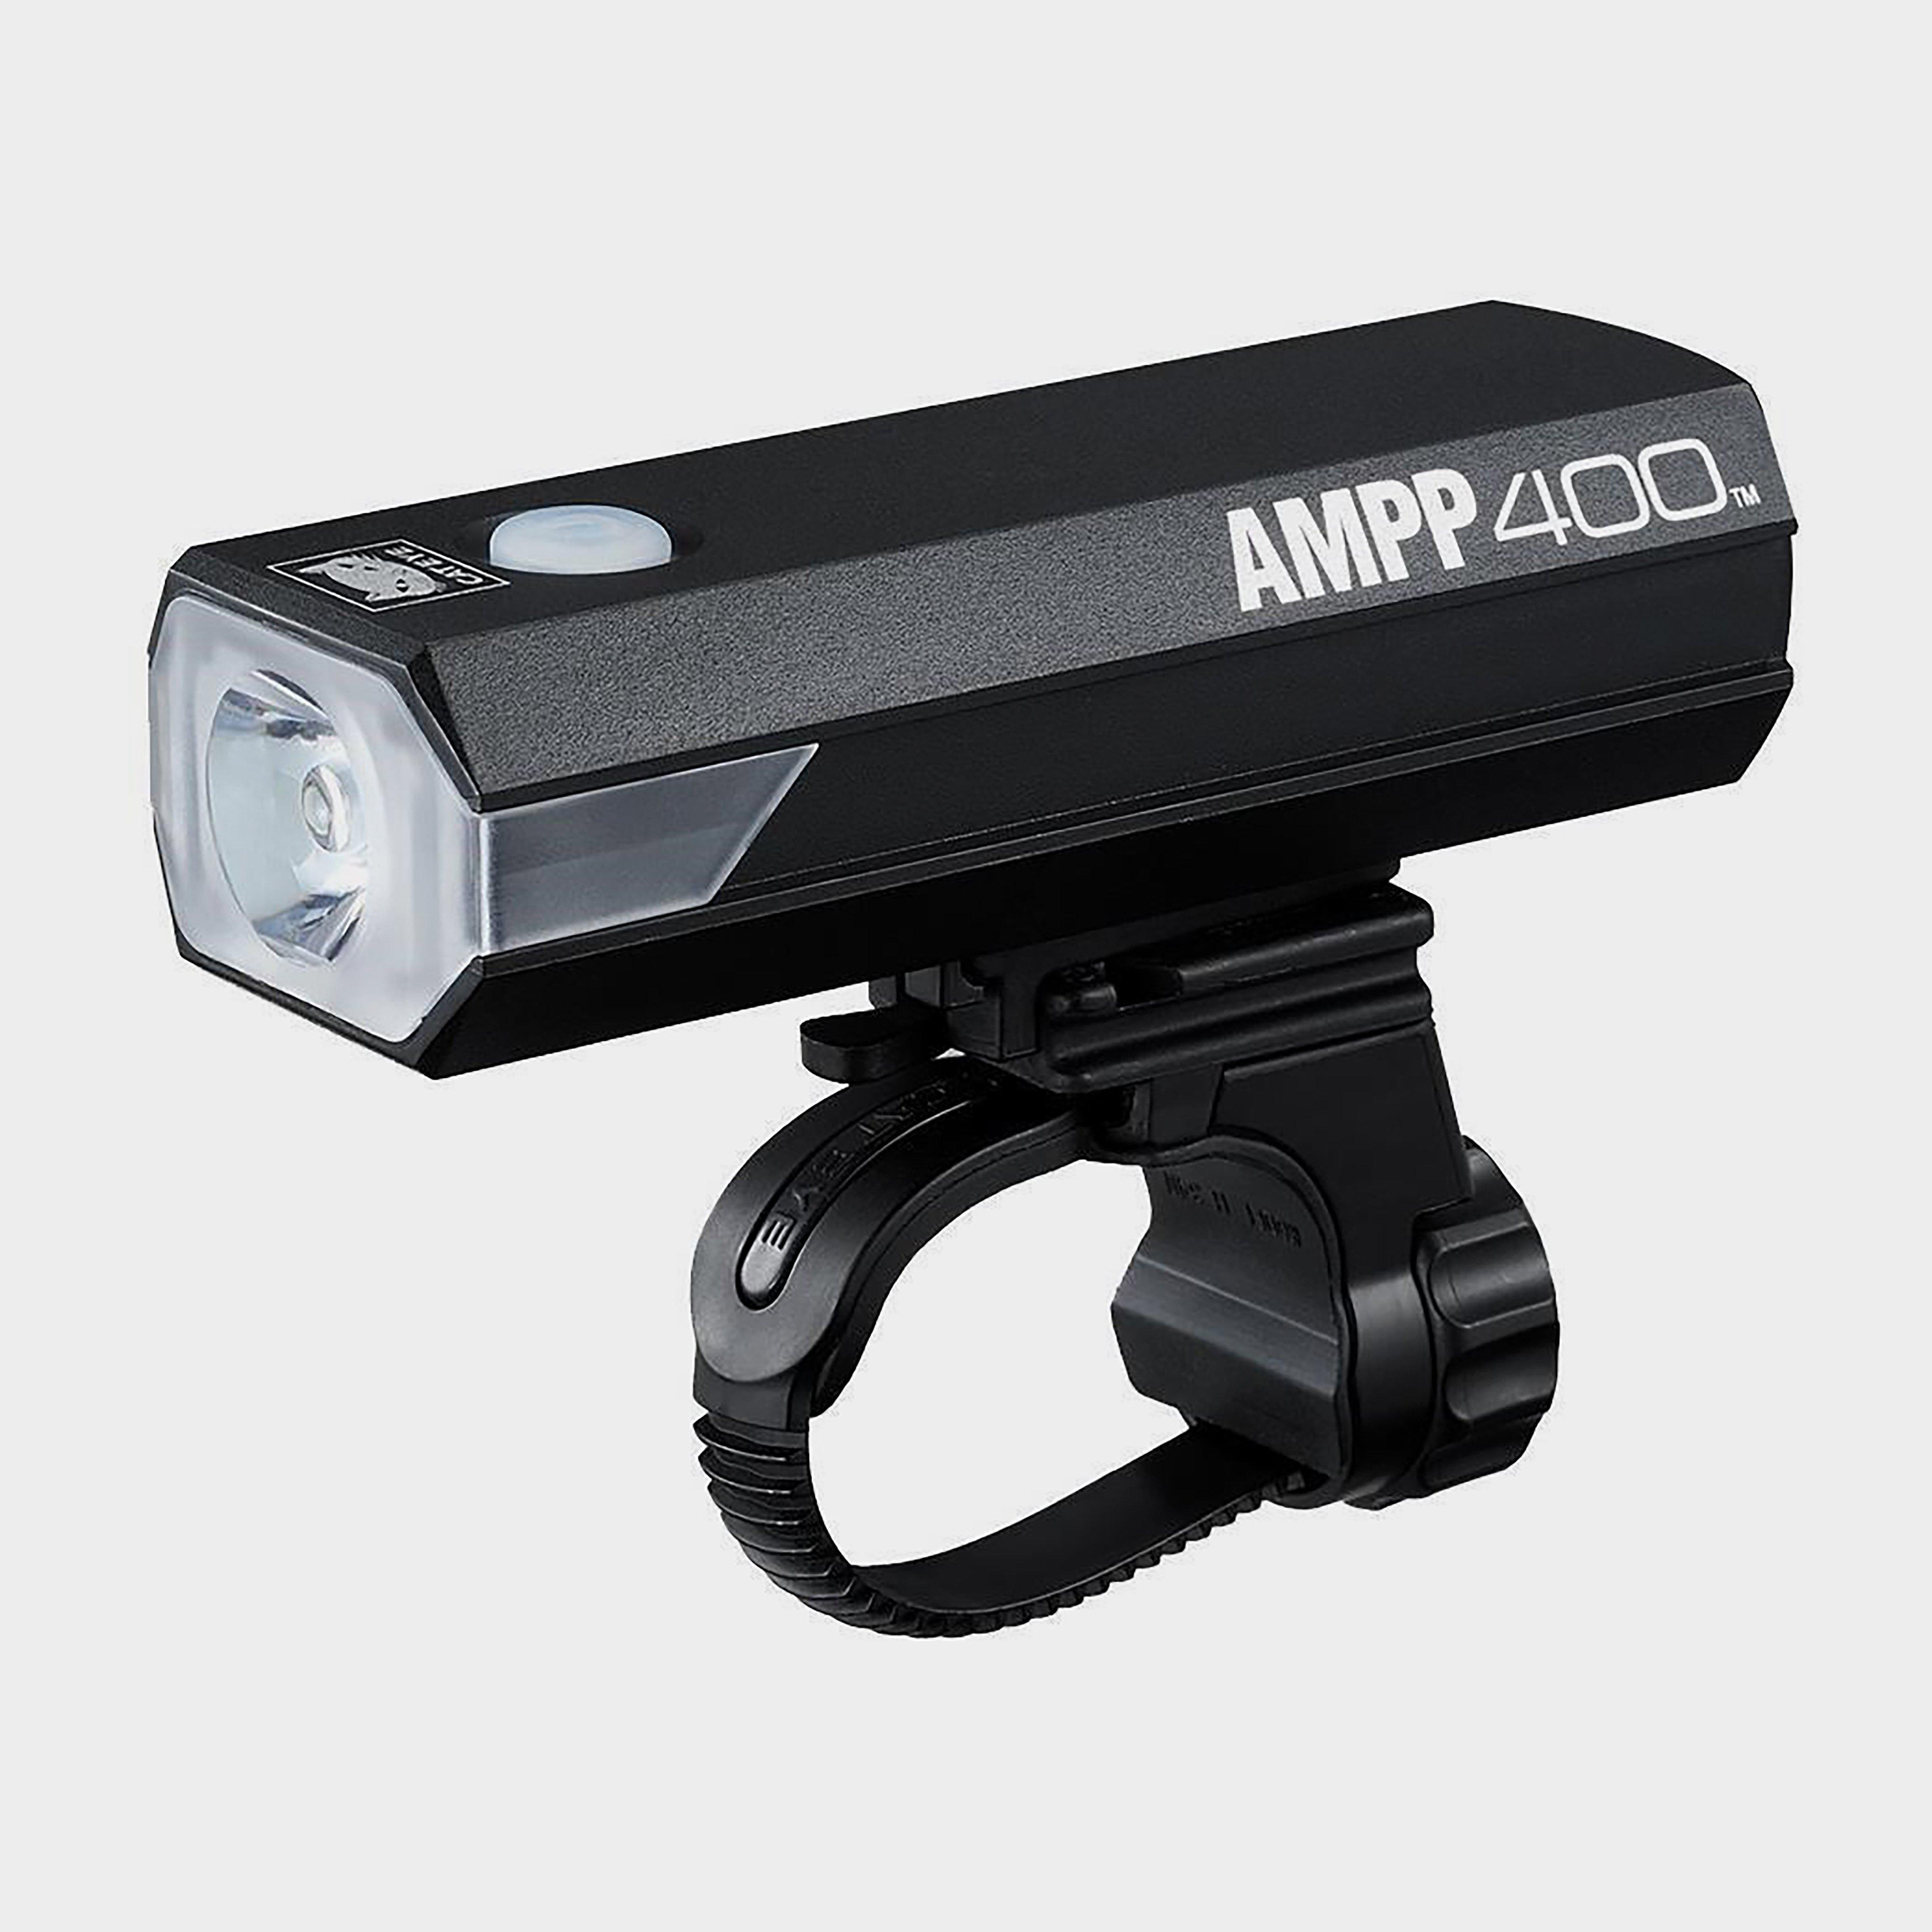 Cateye AMPP400 Front Bike Light, BLACK/NO